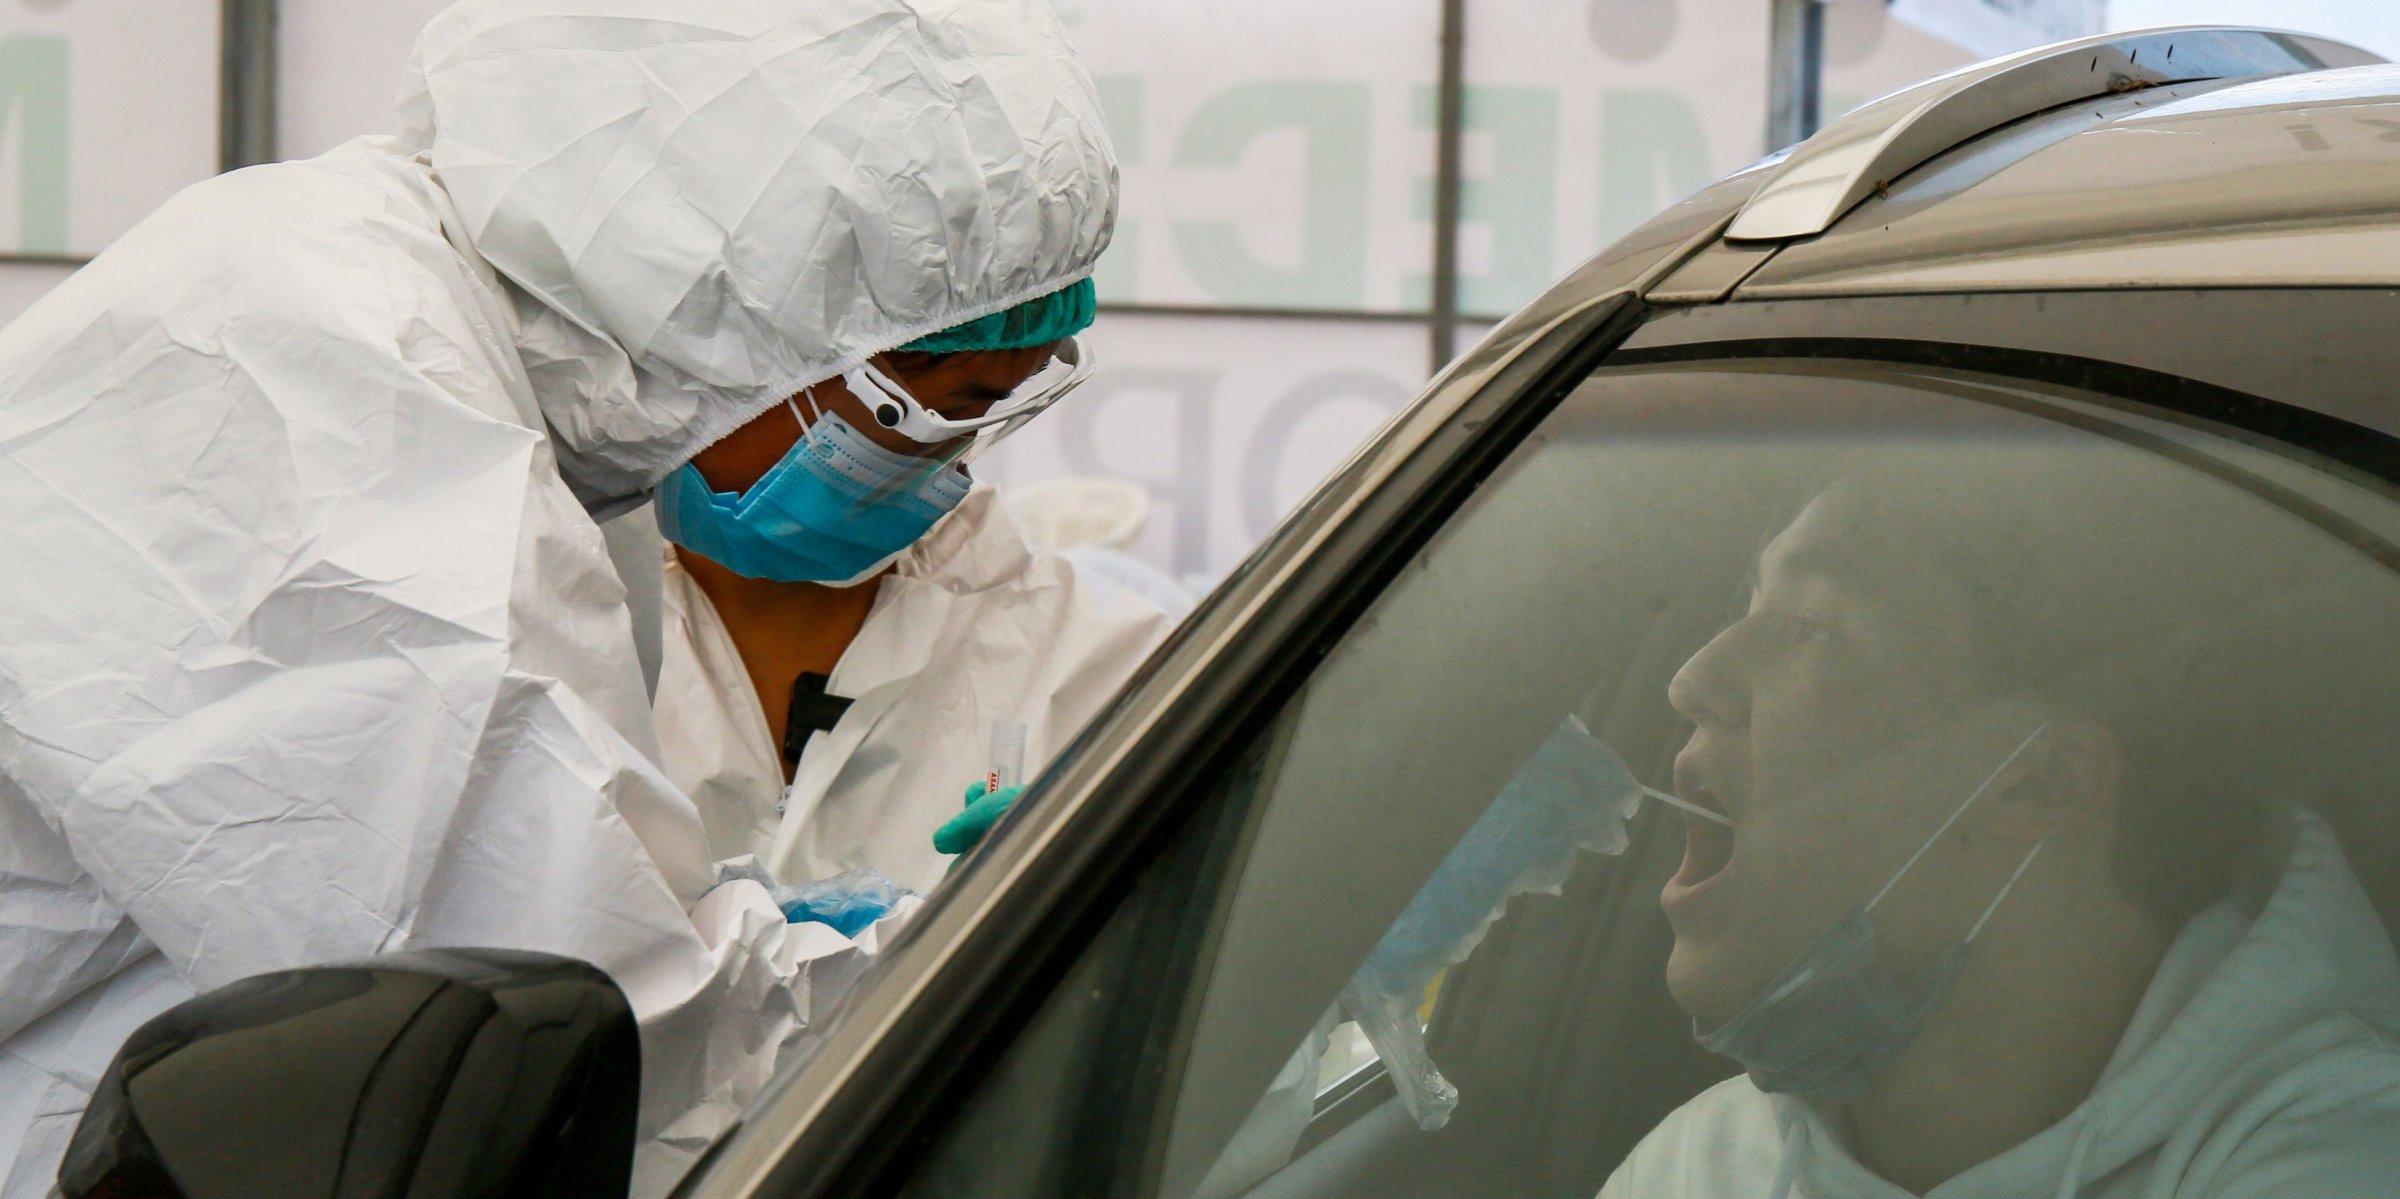 www.dailysabah.com: Uzbekistan, Kazakhstan reimpose lockdowns as coronavirus '2nd wave' hits Central Asia